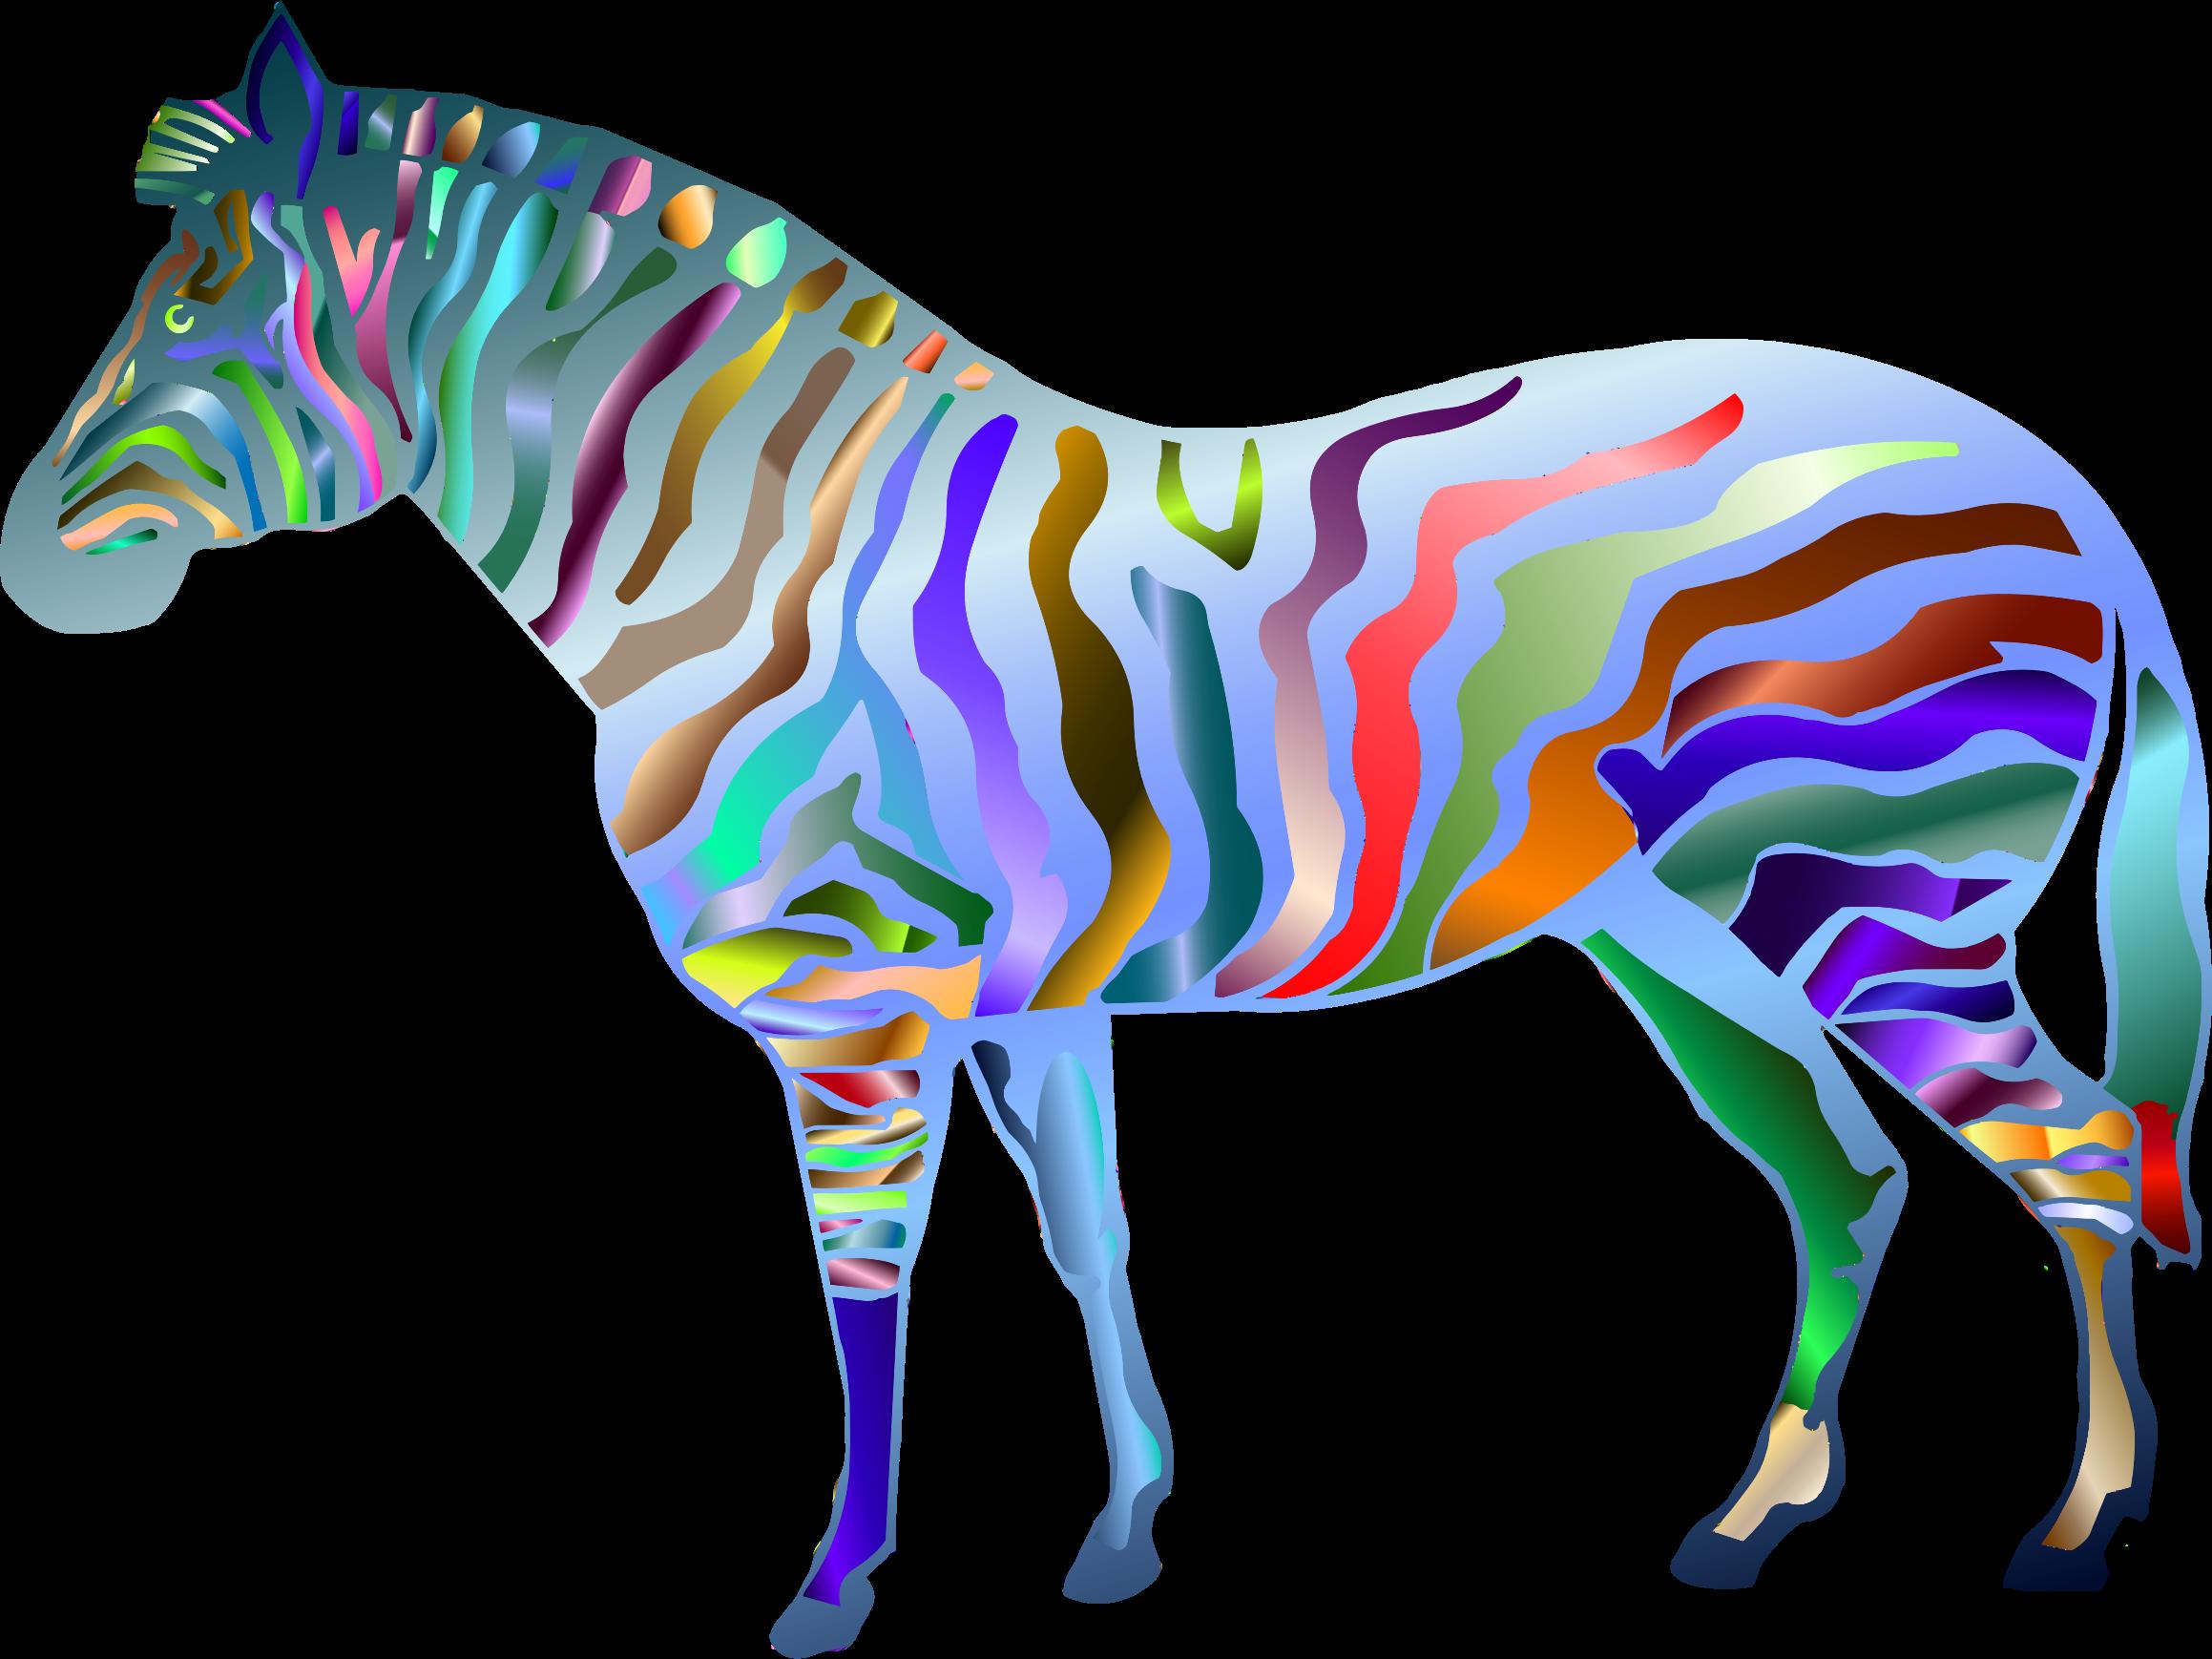 Clipart zebra pdf. Prismatic icons png free